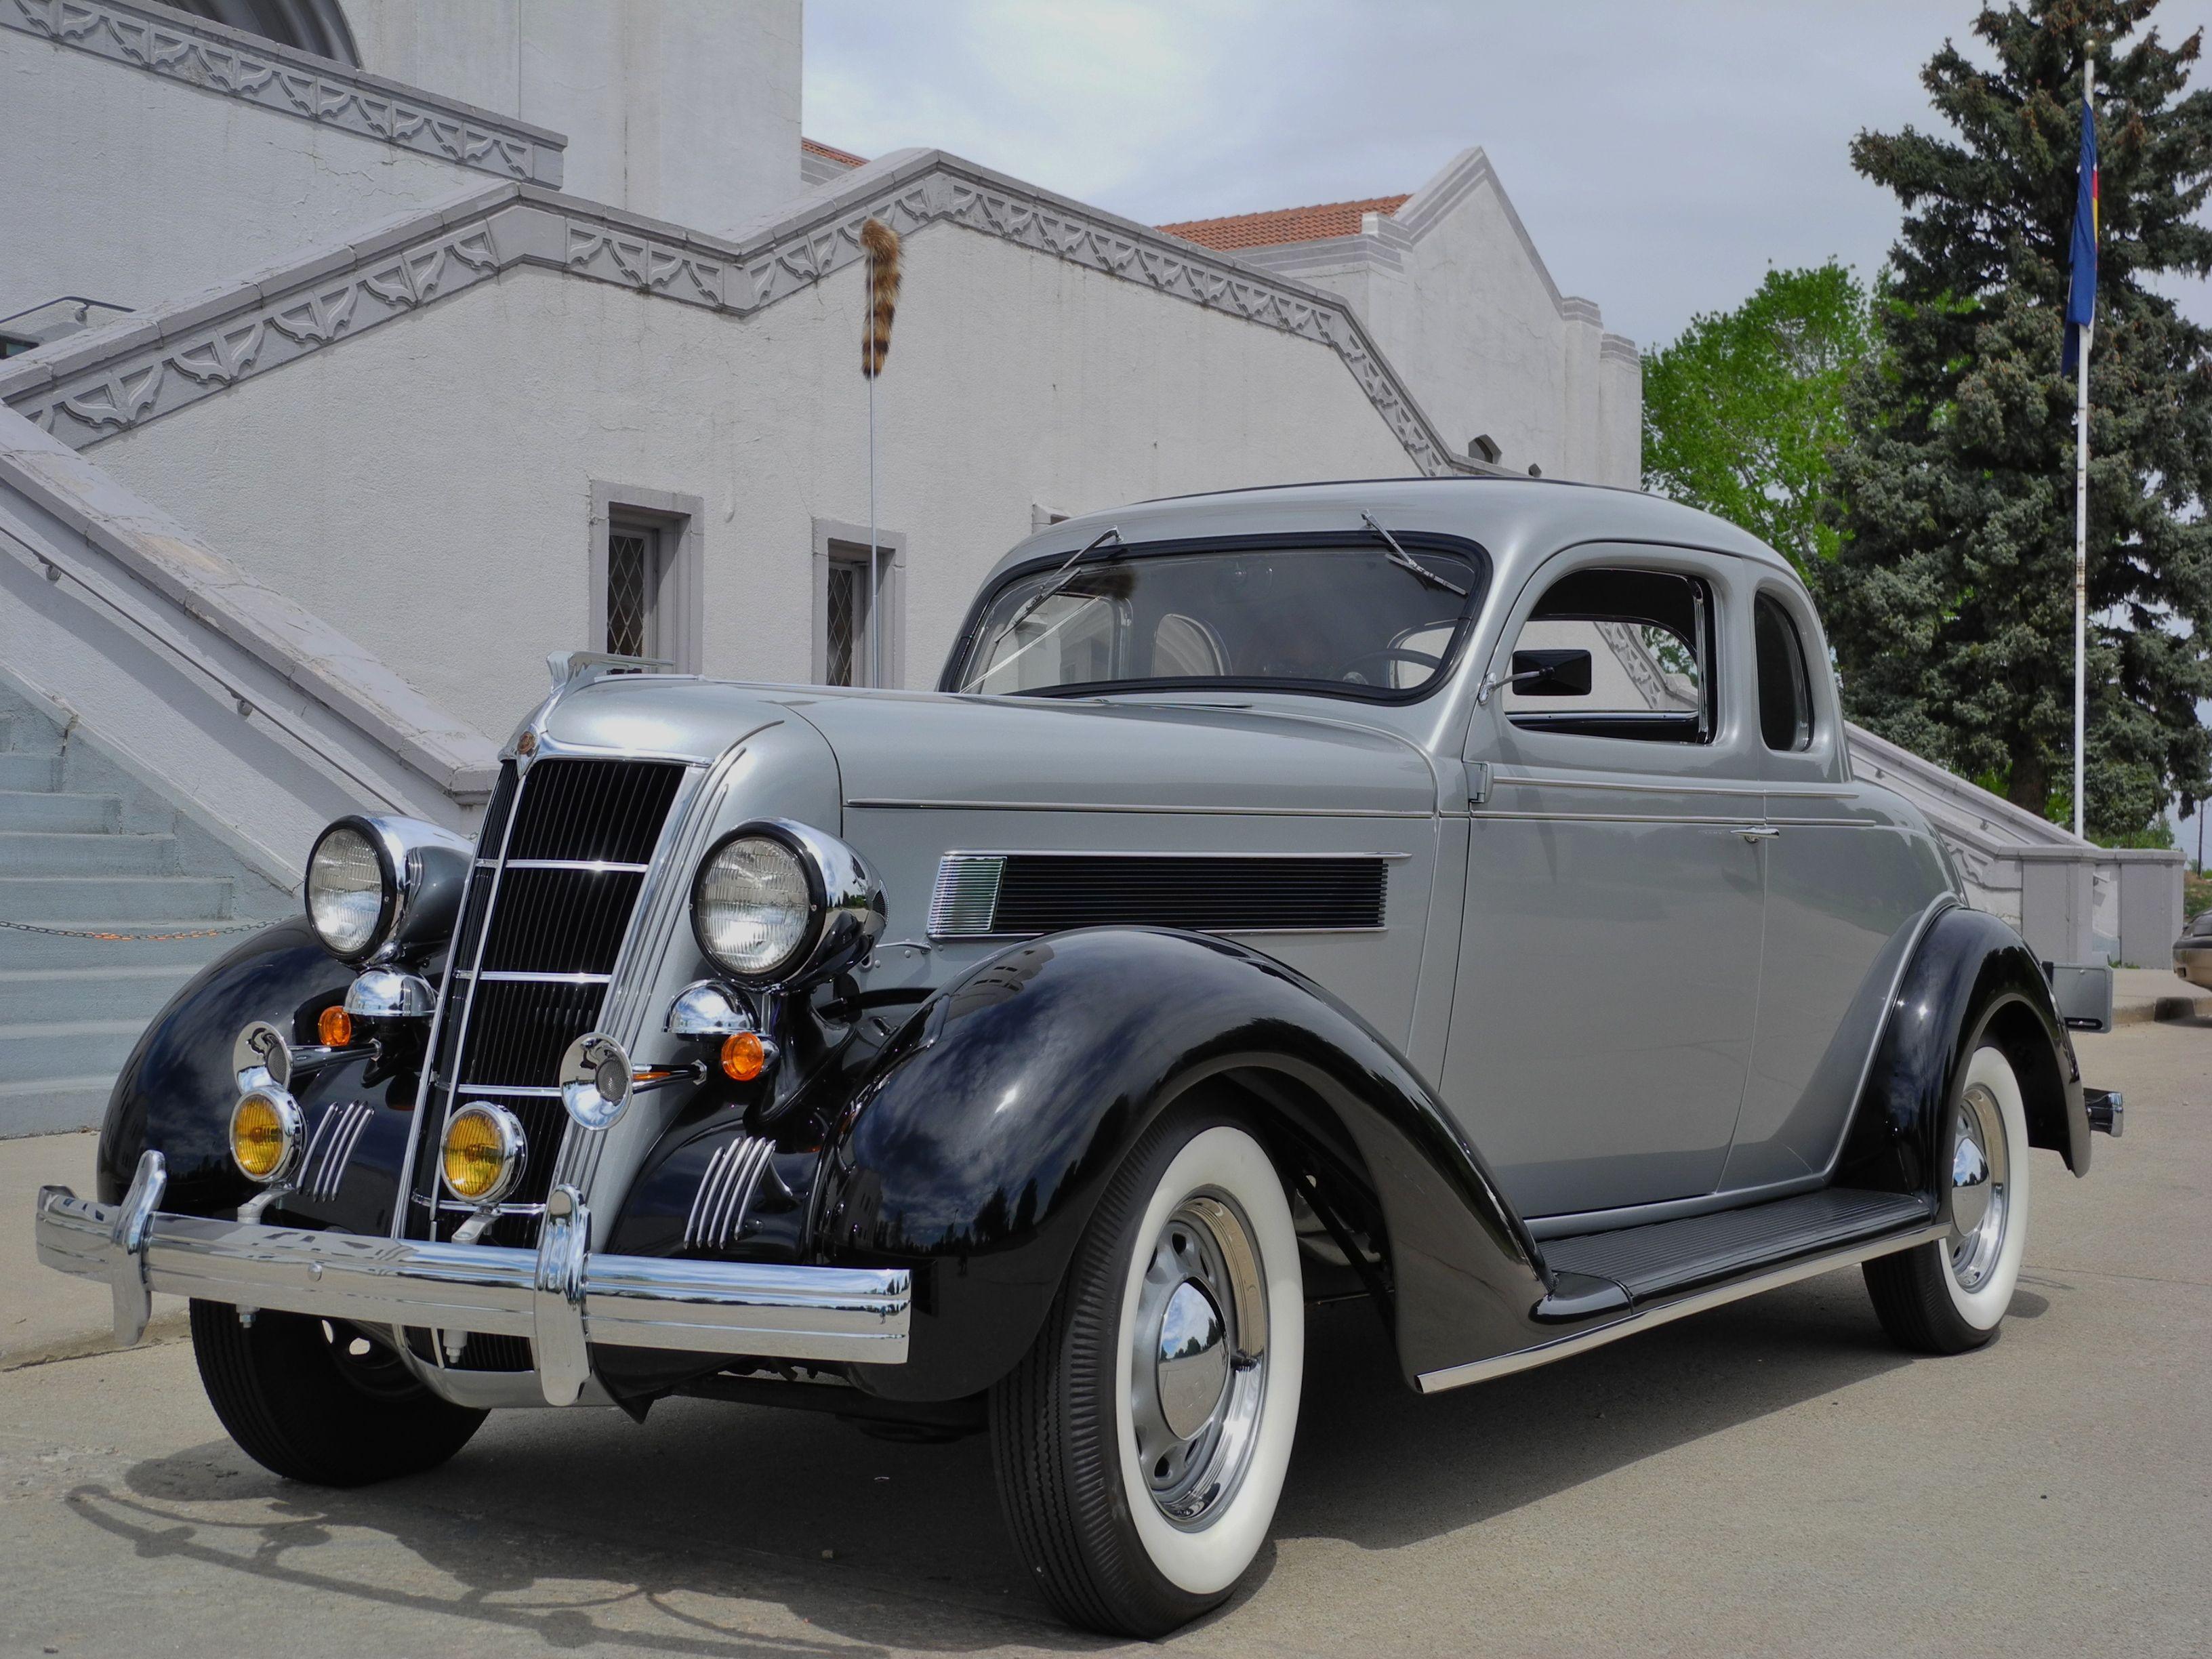 1935 Chrysler Airstream C6 Business Man S Coupe Mopar Cars